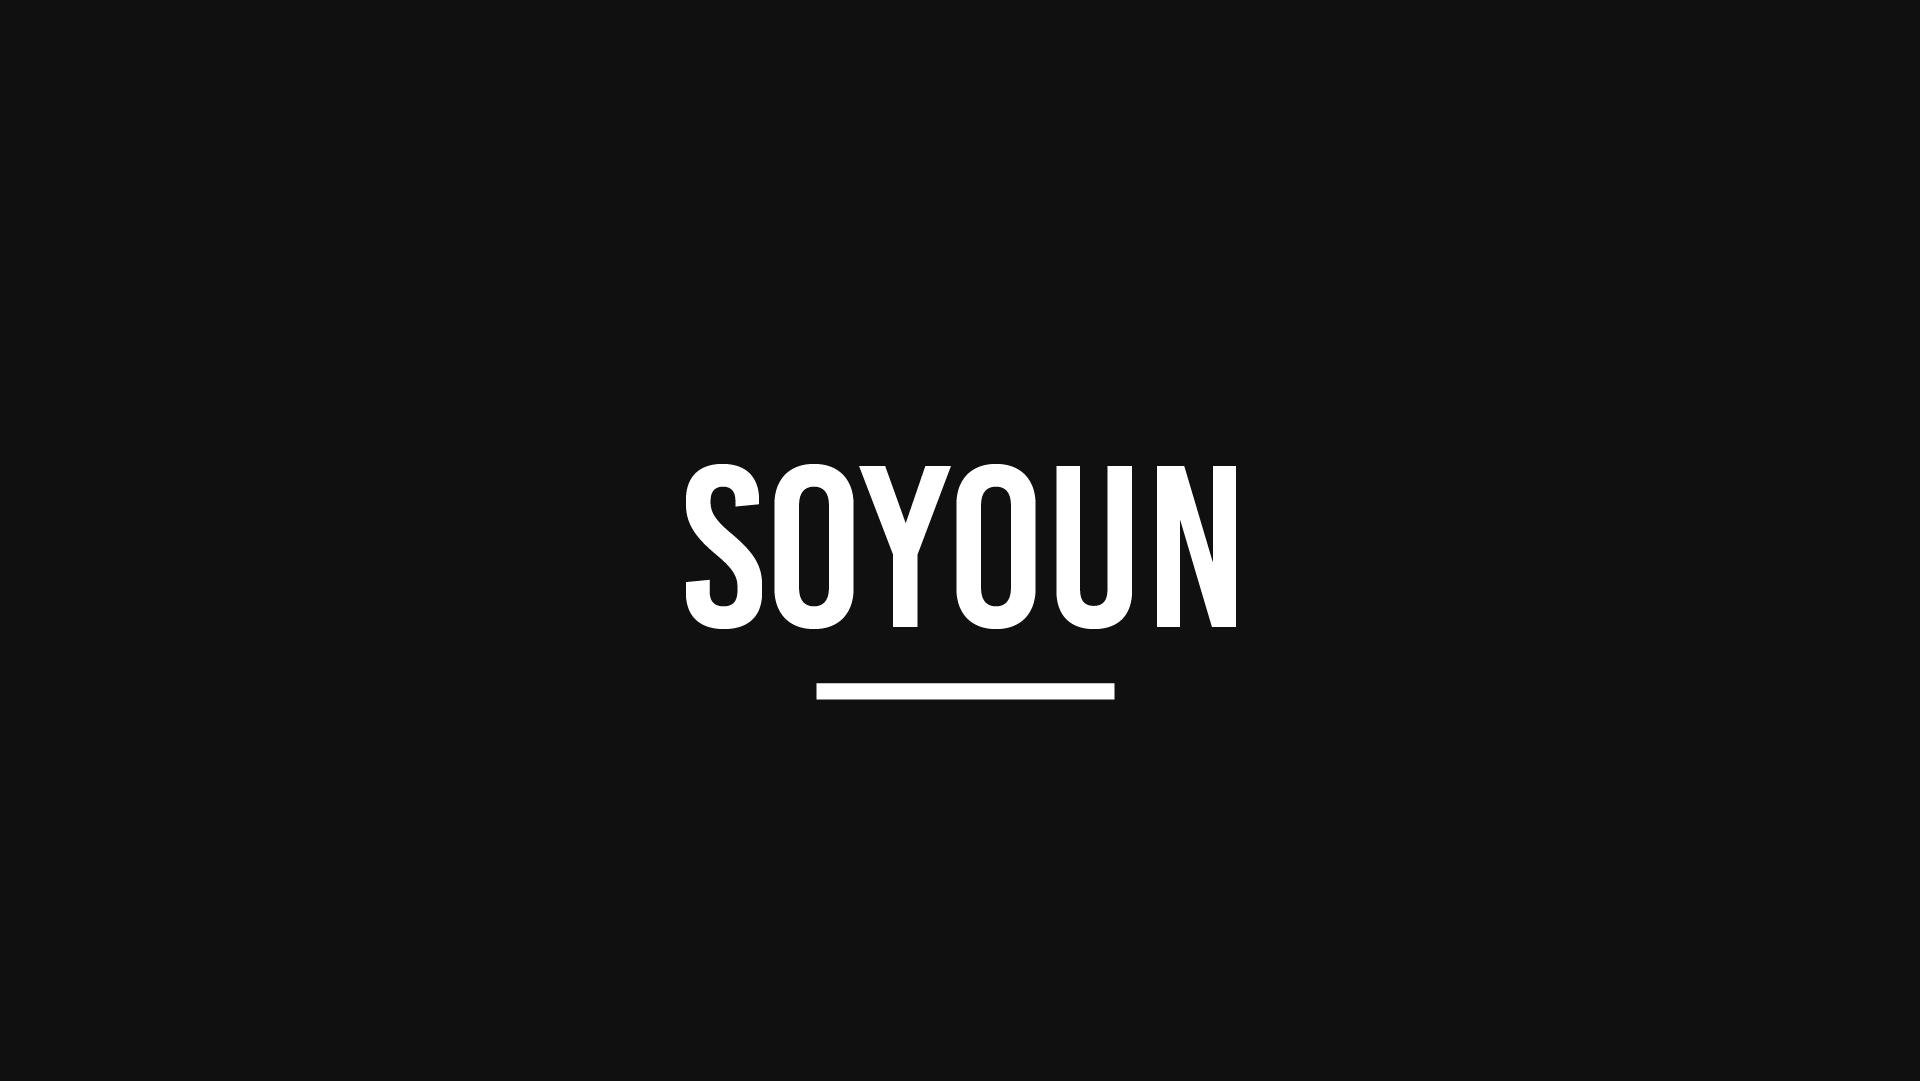 Soyoun